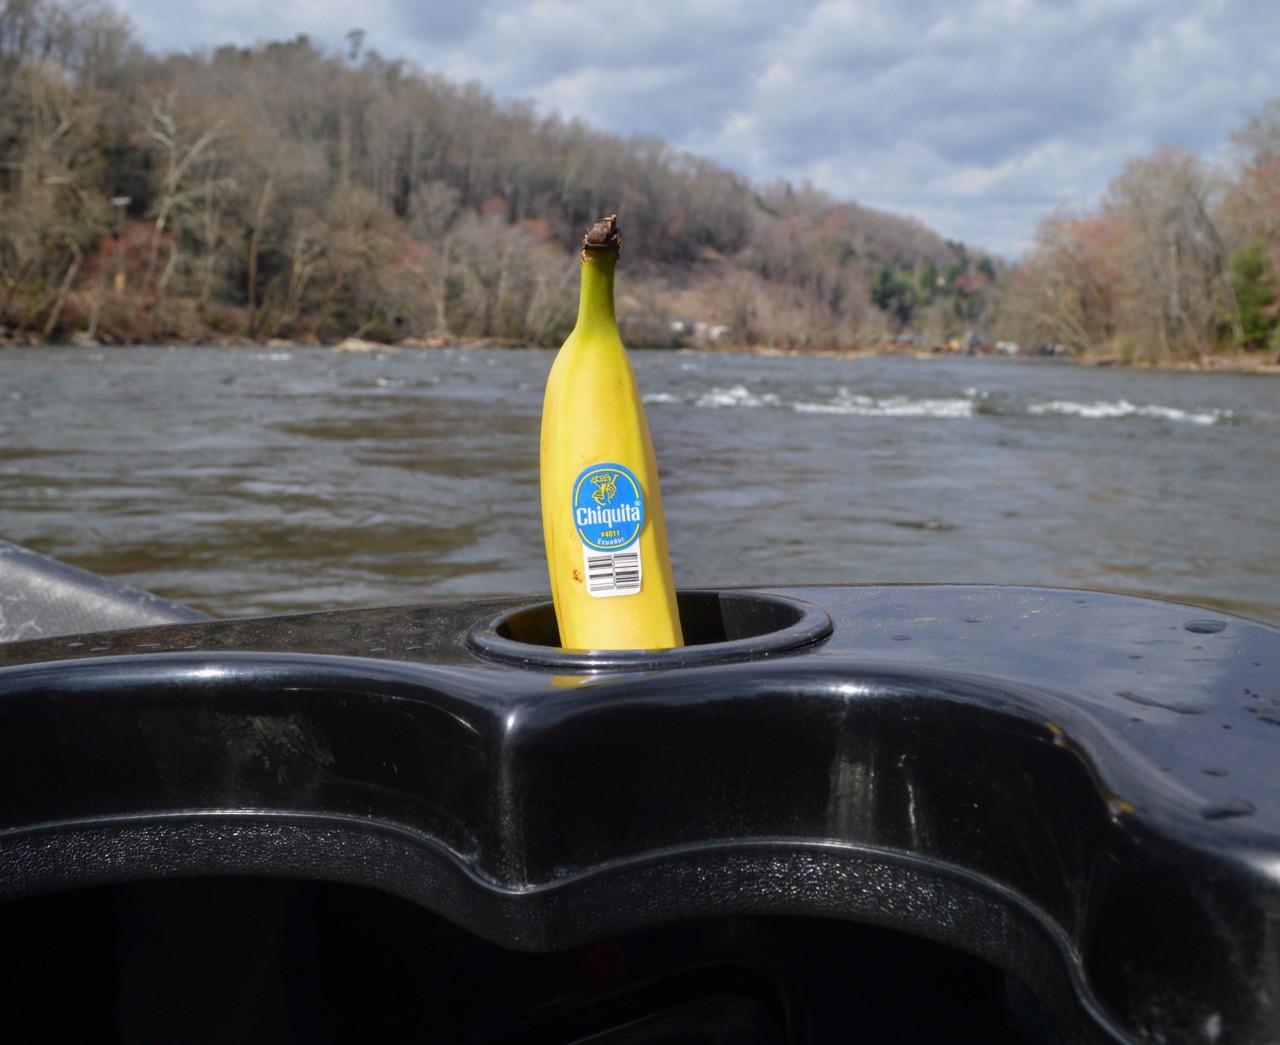 Chiquita banana riding shotgun in the drift boat while fly fishing the Tuckasegee River in North Carolina